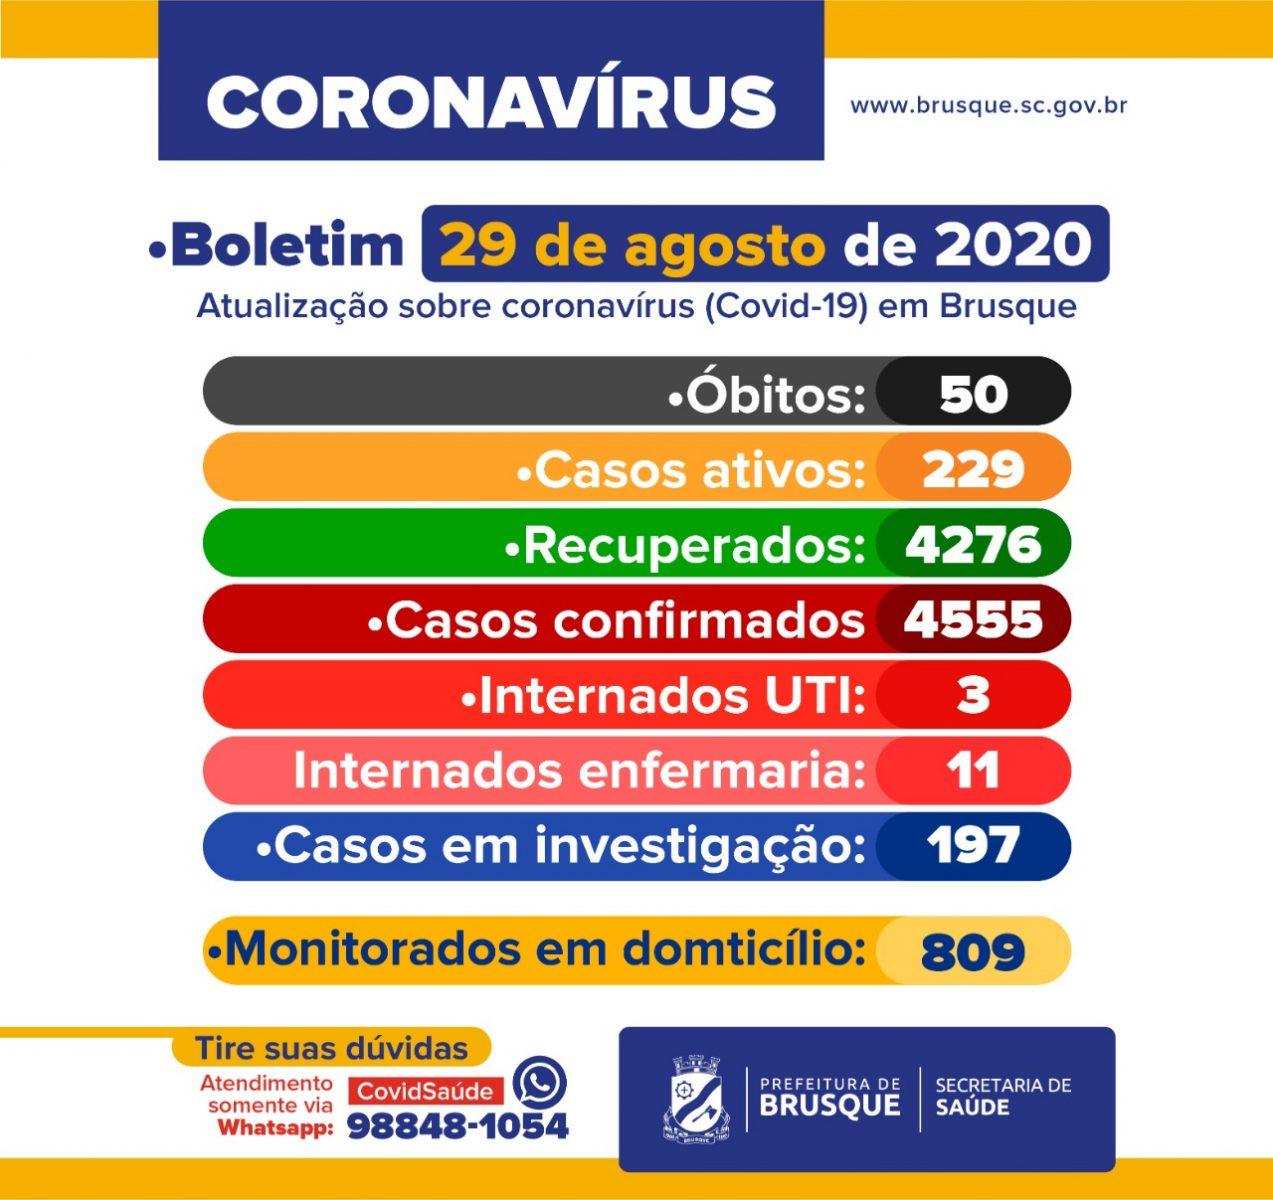 COVID-19: Boletim epidemiológico deste sábado (29) de agosto